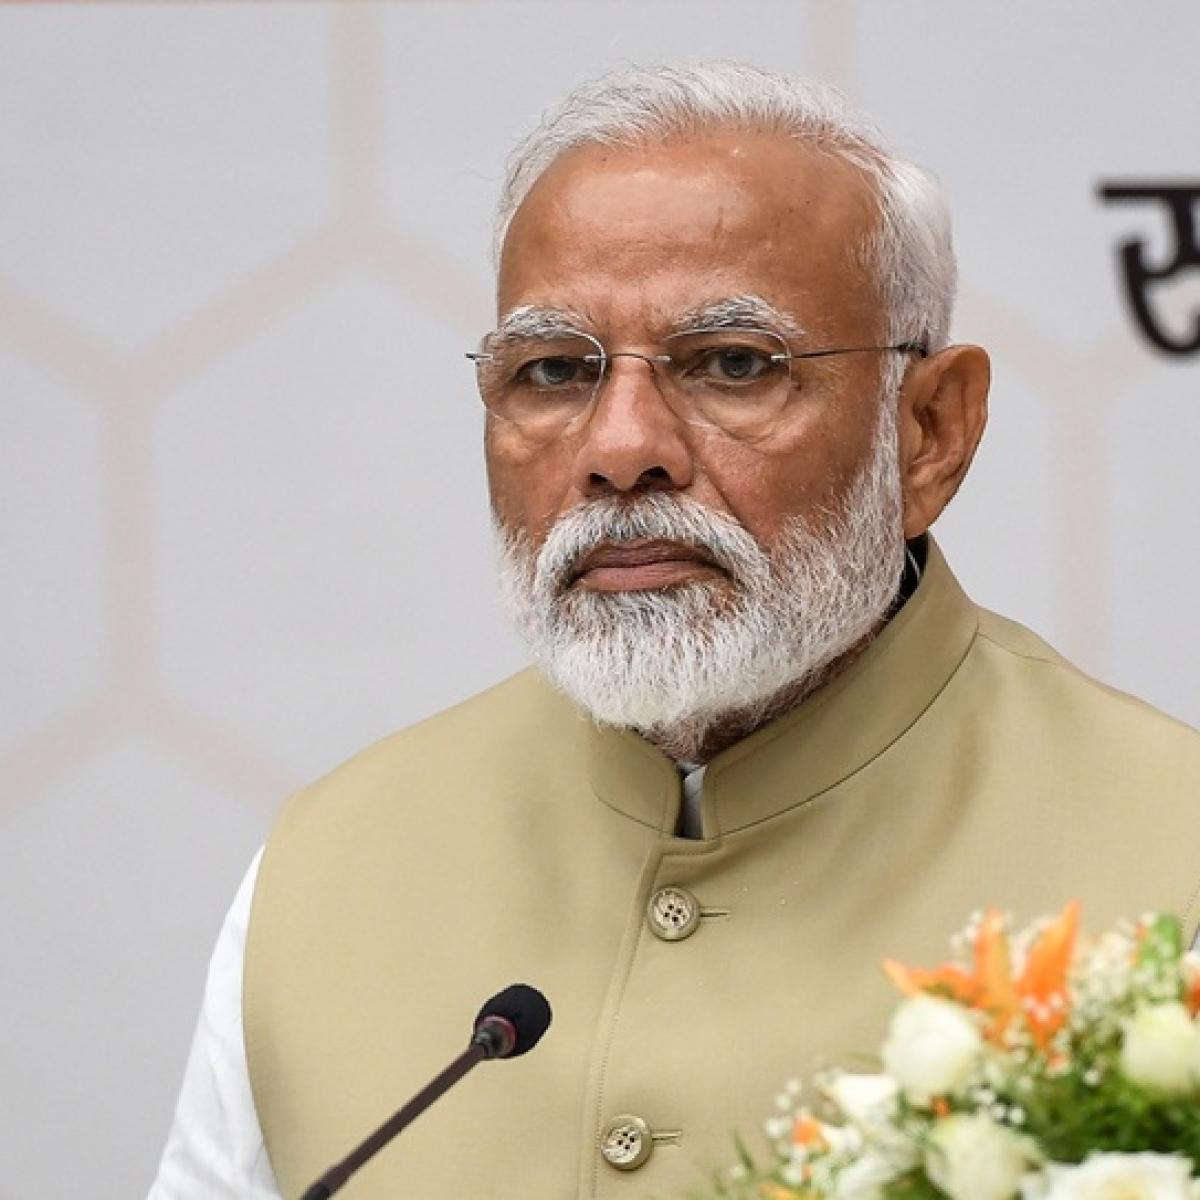 Arrogance, misbehaviour can't be tolerated, says PM Narendra Modi on BJP MLA Akash Vijayvargiya's bat assault